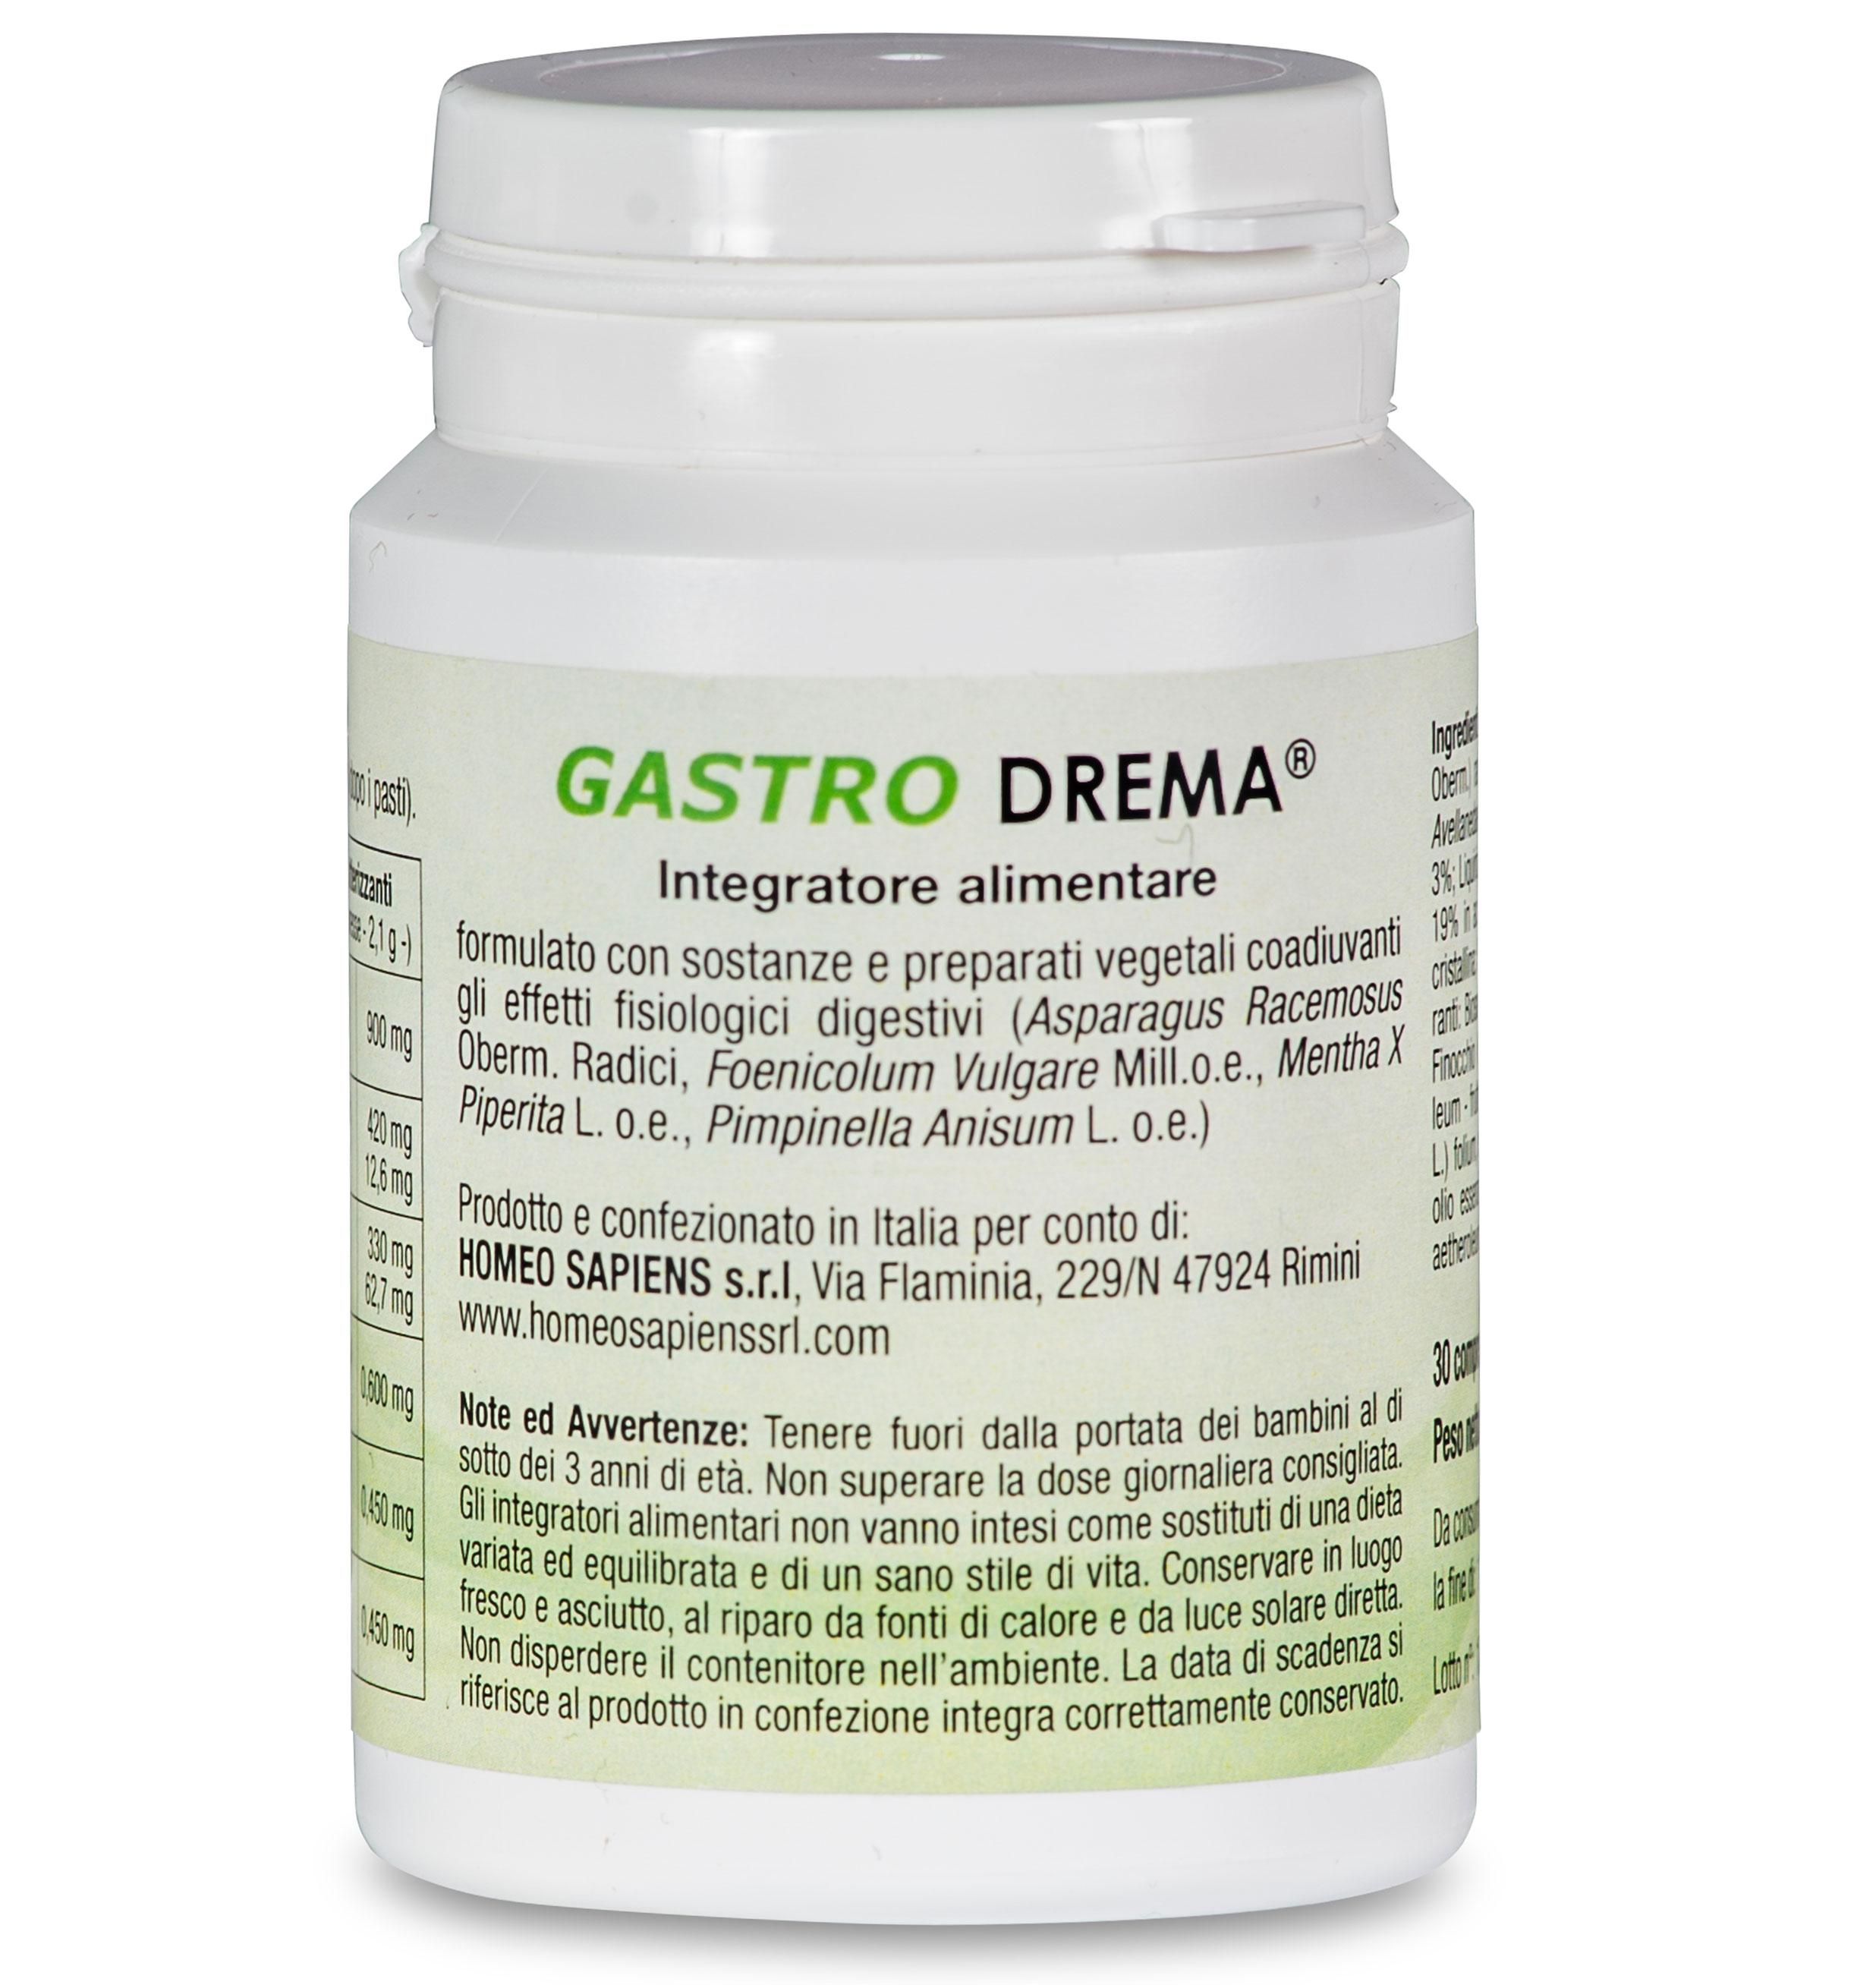 GASTRO-DREMA-AL-21-03-18-OK